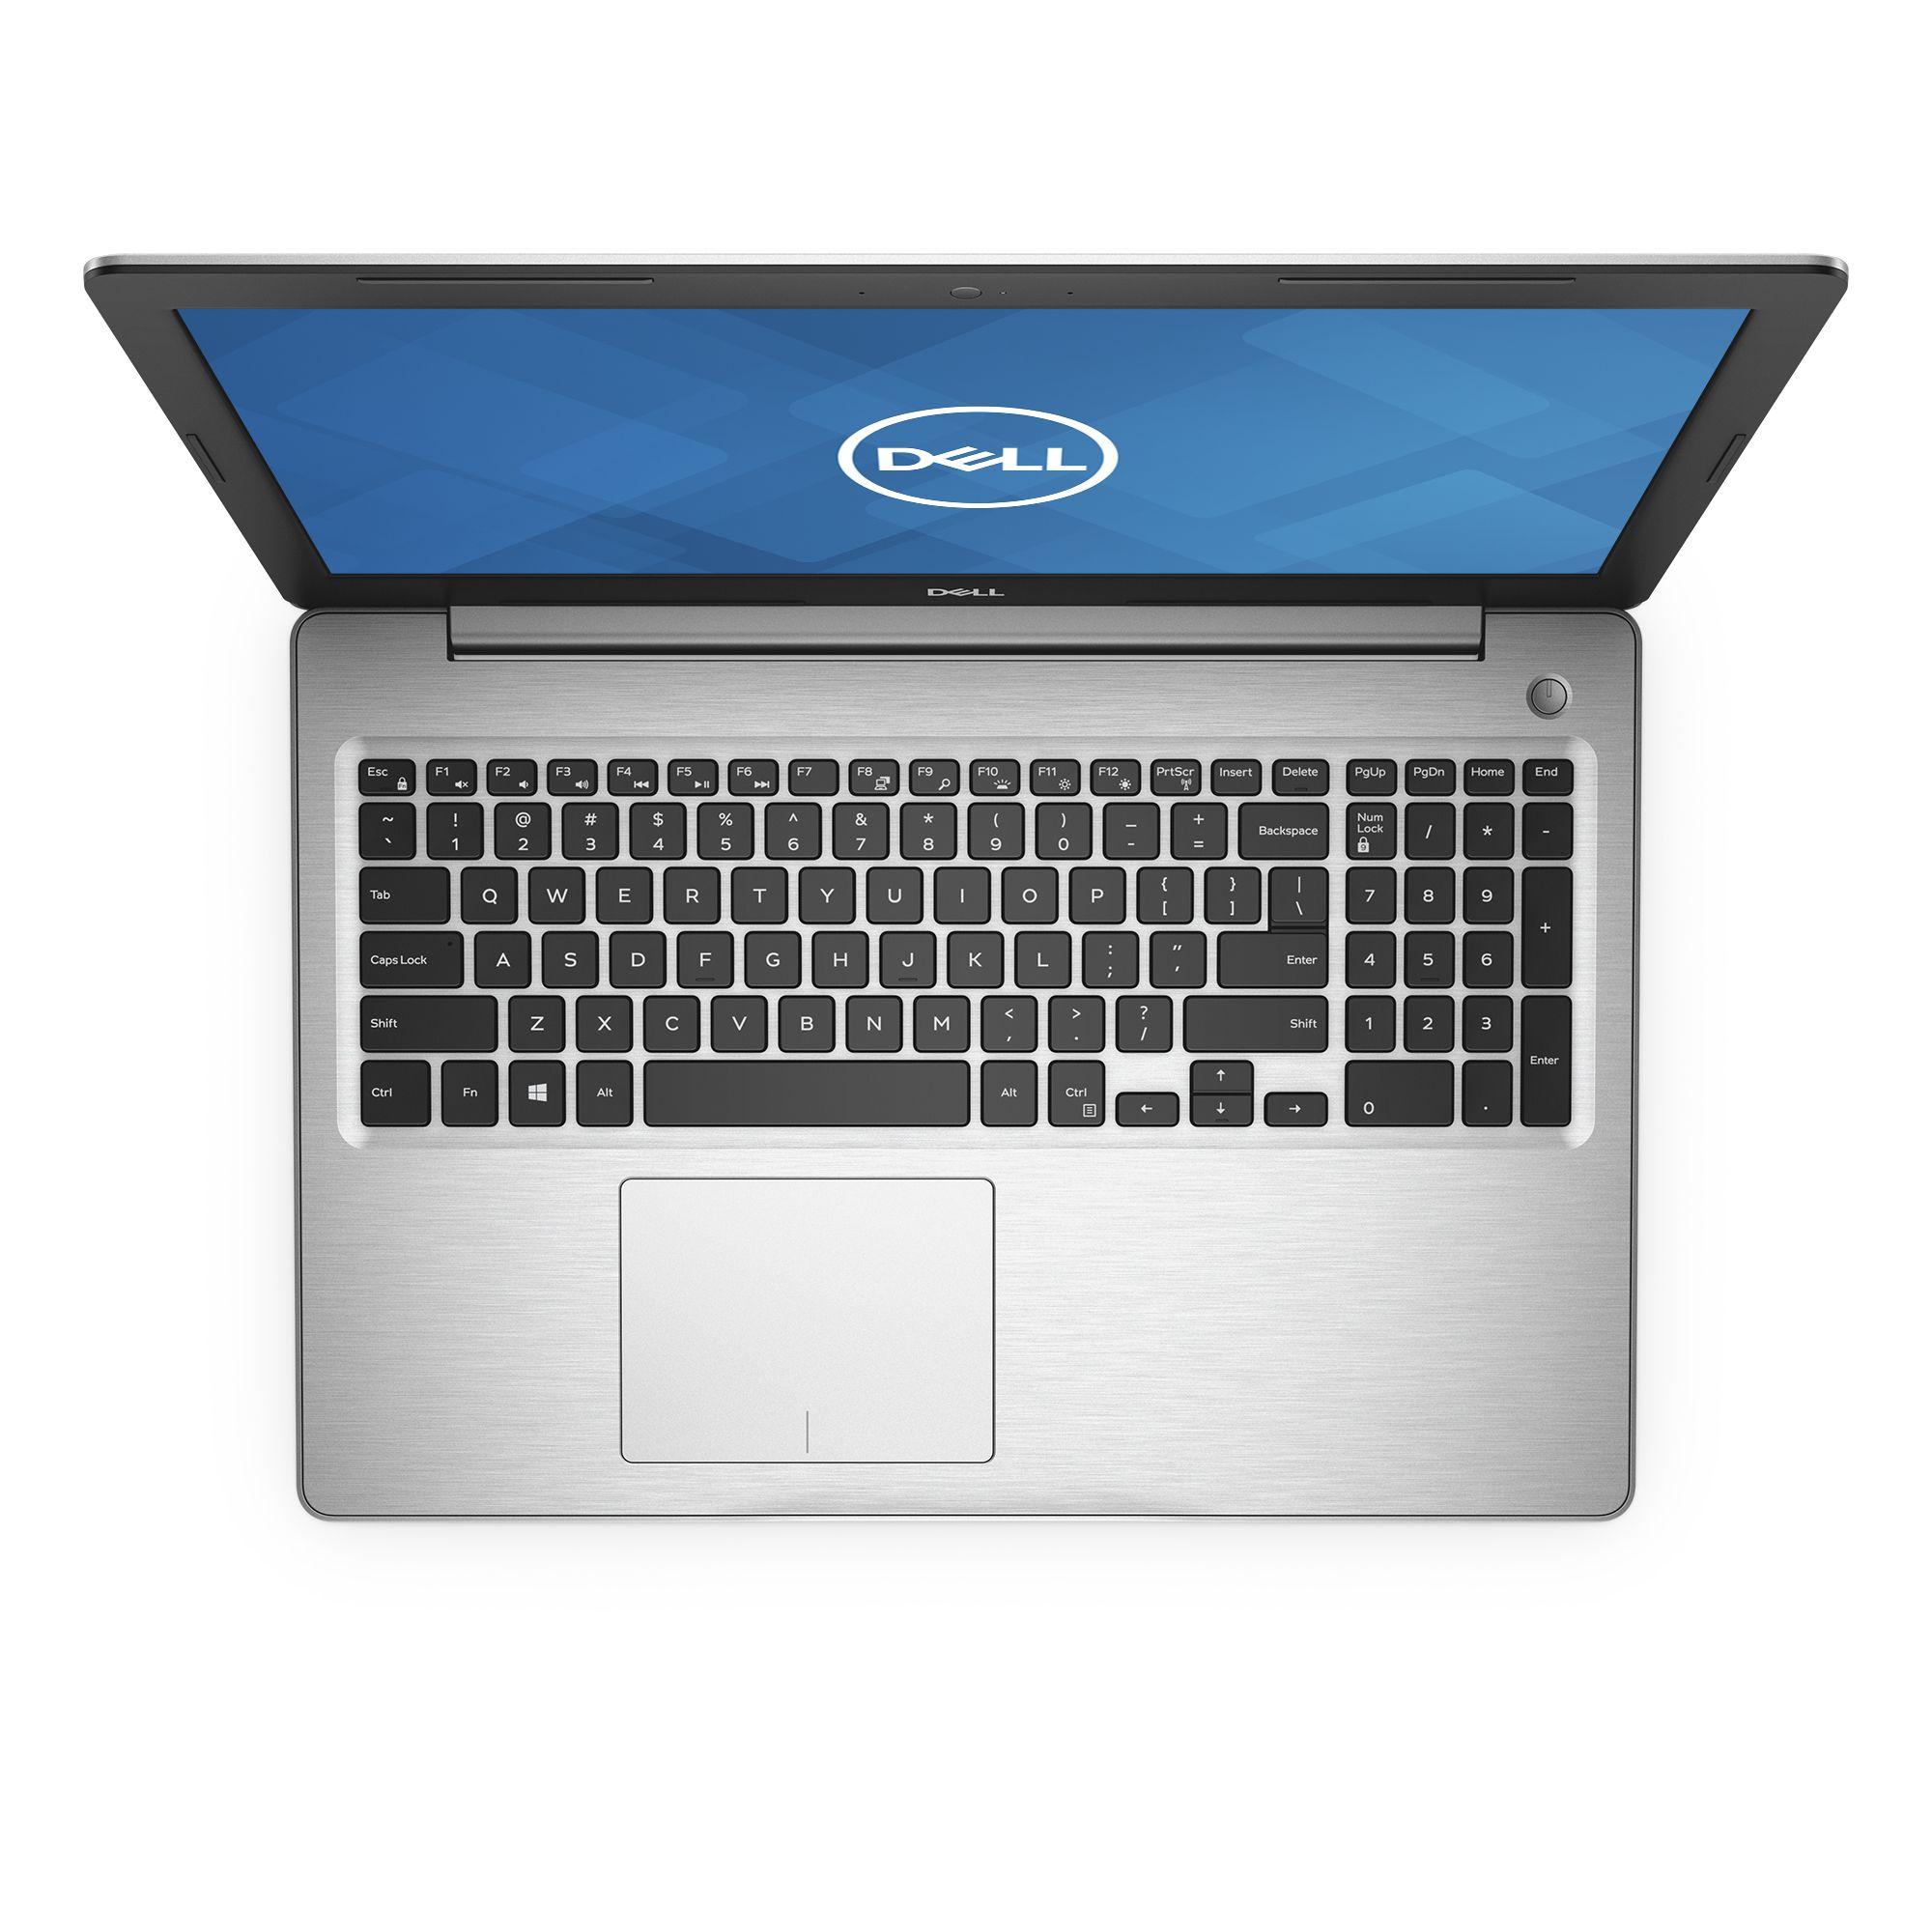 Dell Inspiron 15 5000 (5575) Laptop, 15 6¡±, AMD Ryzen? 5